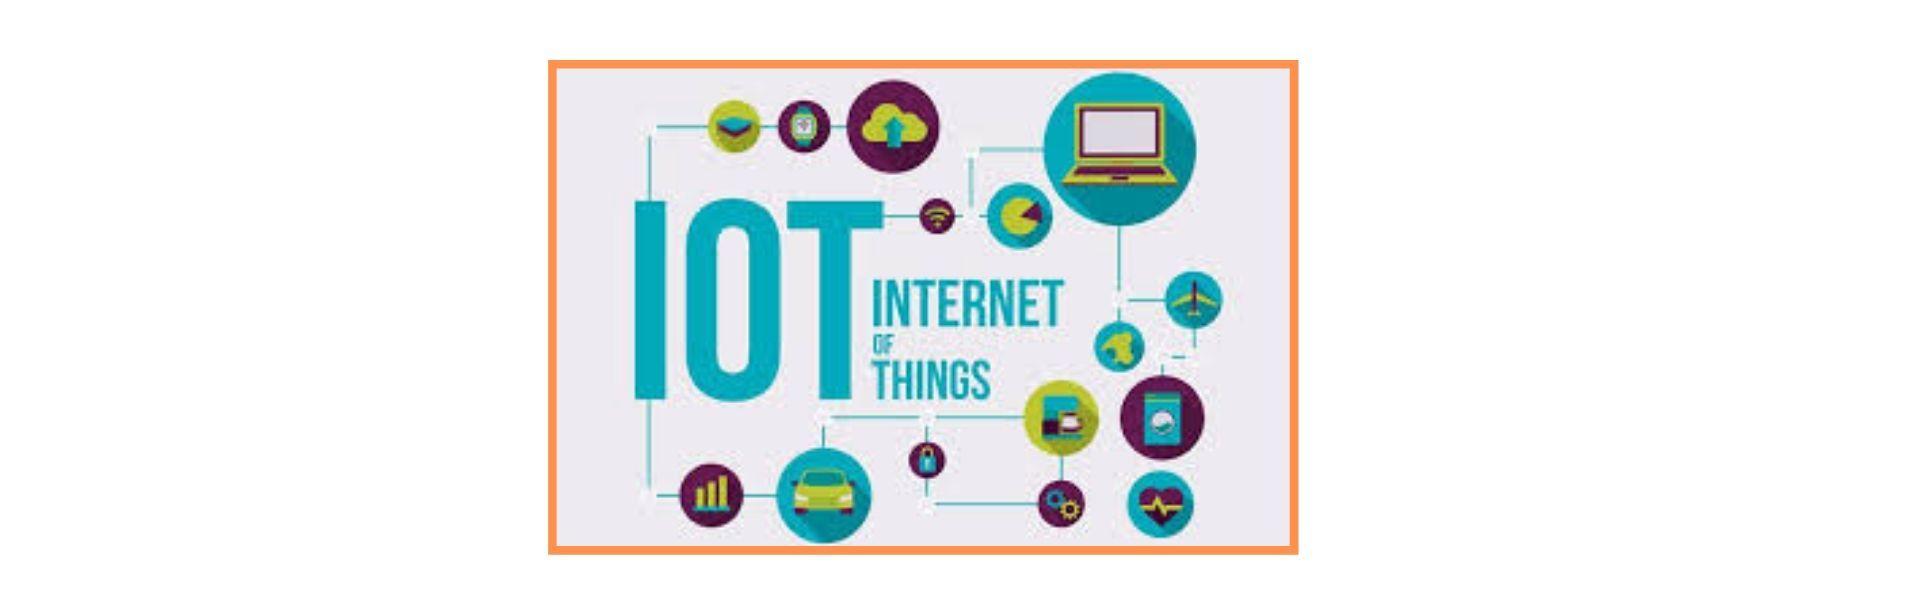 IoT Start-ups In India